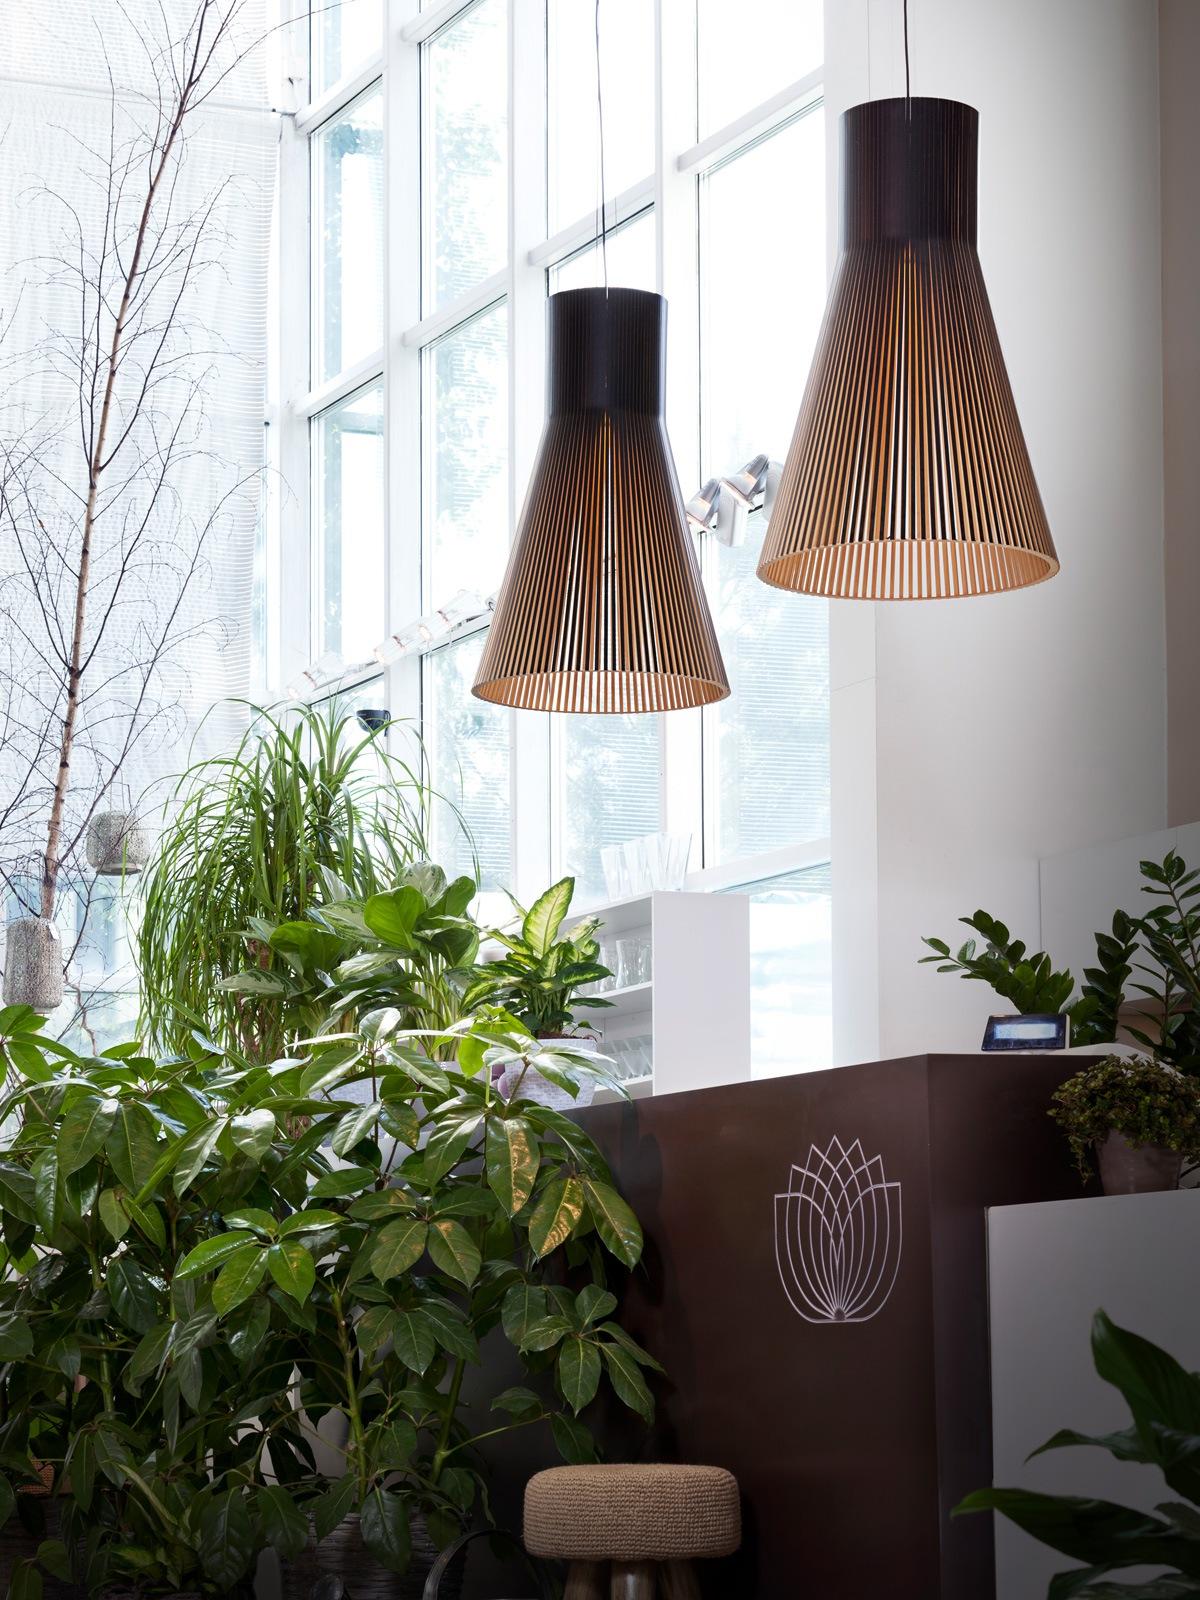 Magnum 4202 Secto Leuchte Holz skandinavisch Designort Leuchten Berlin